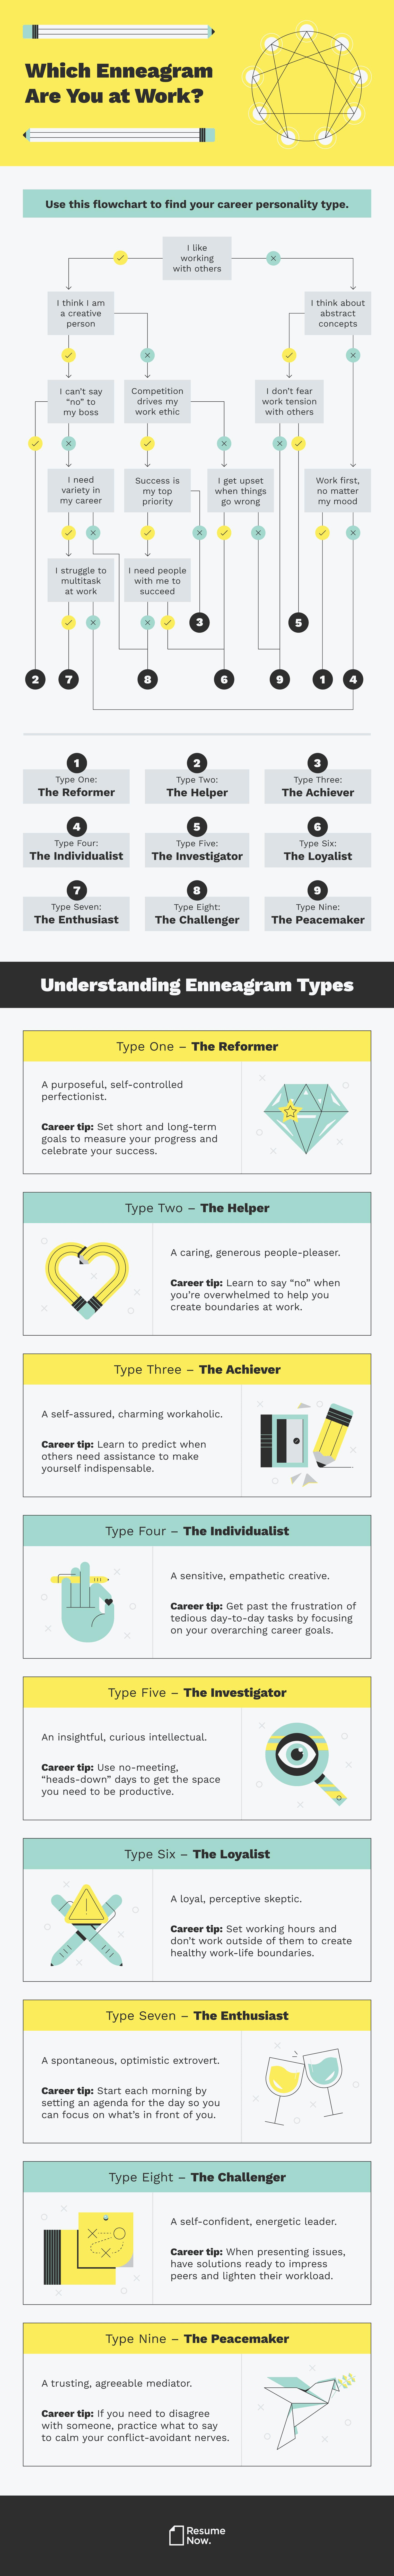 Career Enneagram - Creative thinking